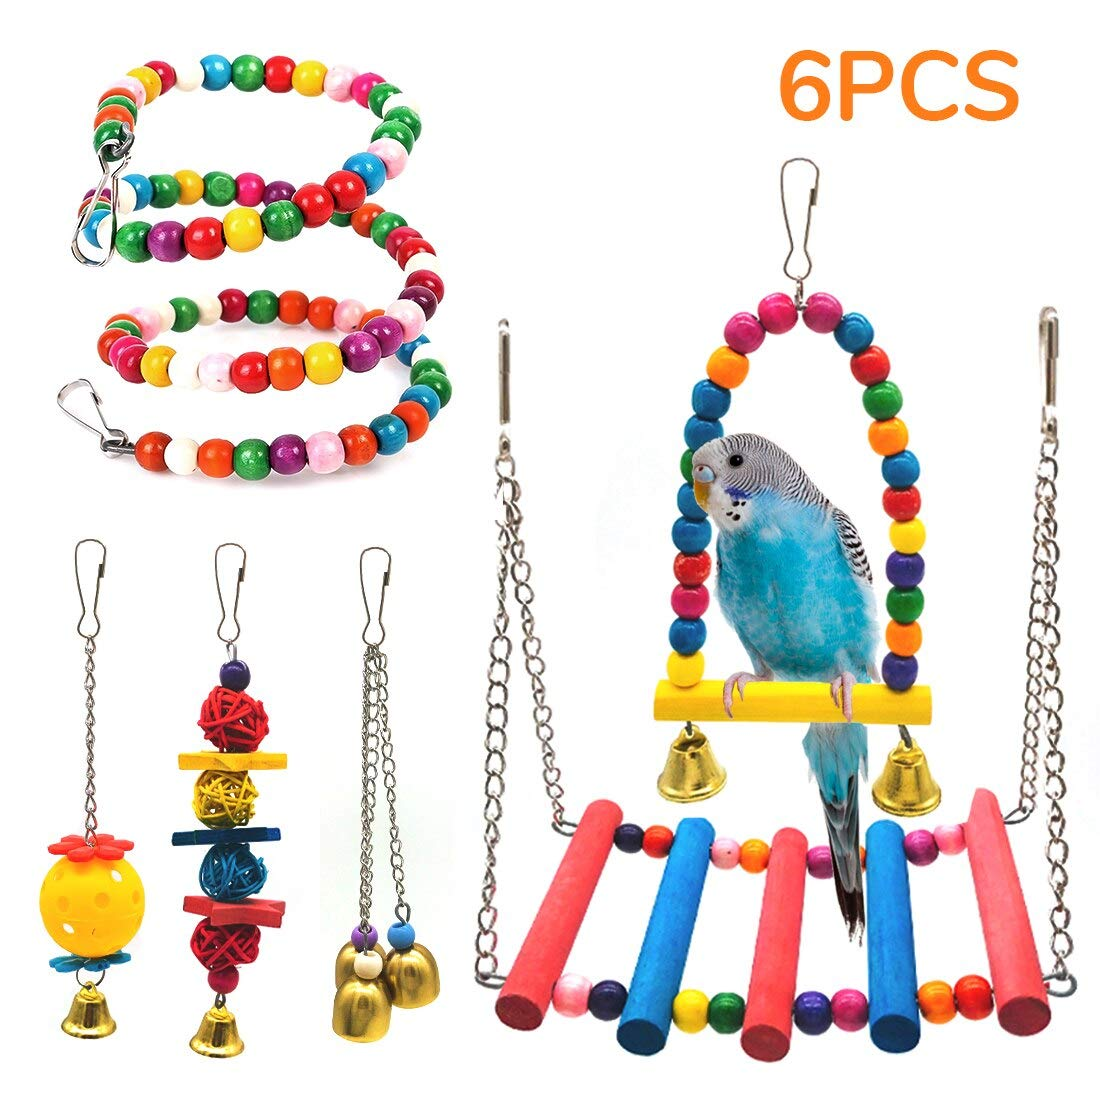 SSRIVER Bird Toys Bird Swing Parrot Bed Ladder Budgie Hammock Macaws Bite Parakeets Bell Lovebirds Rattan Conures Perch…